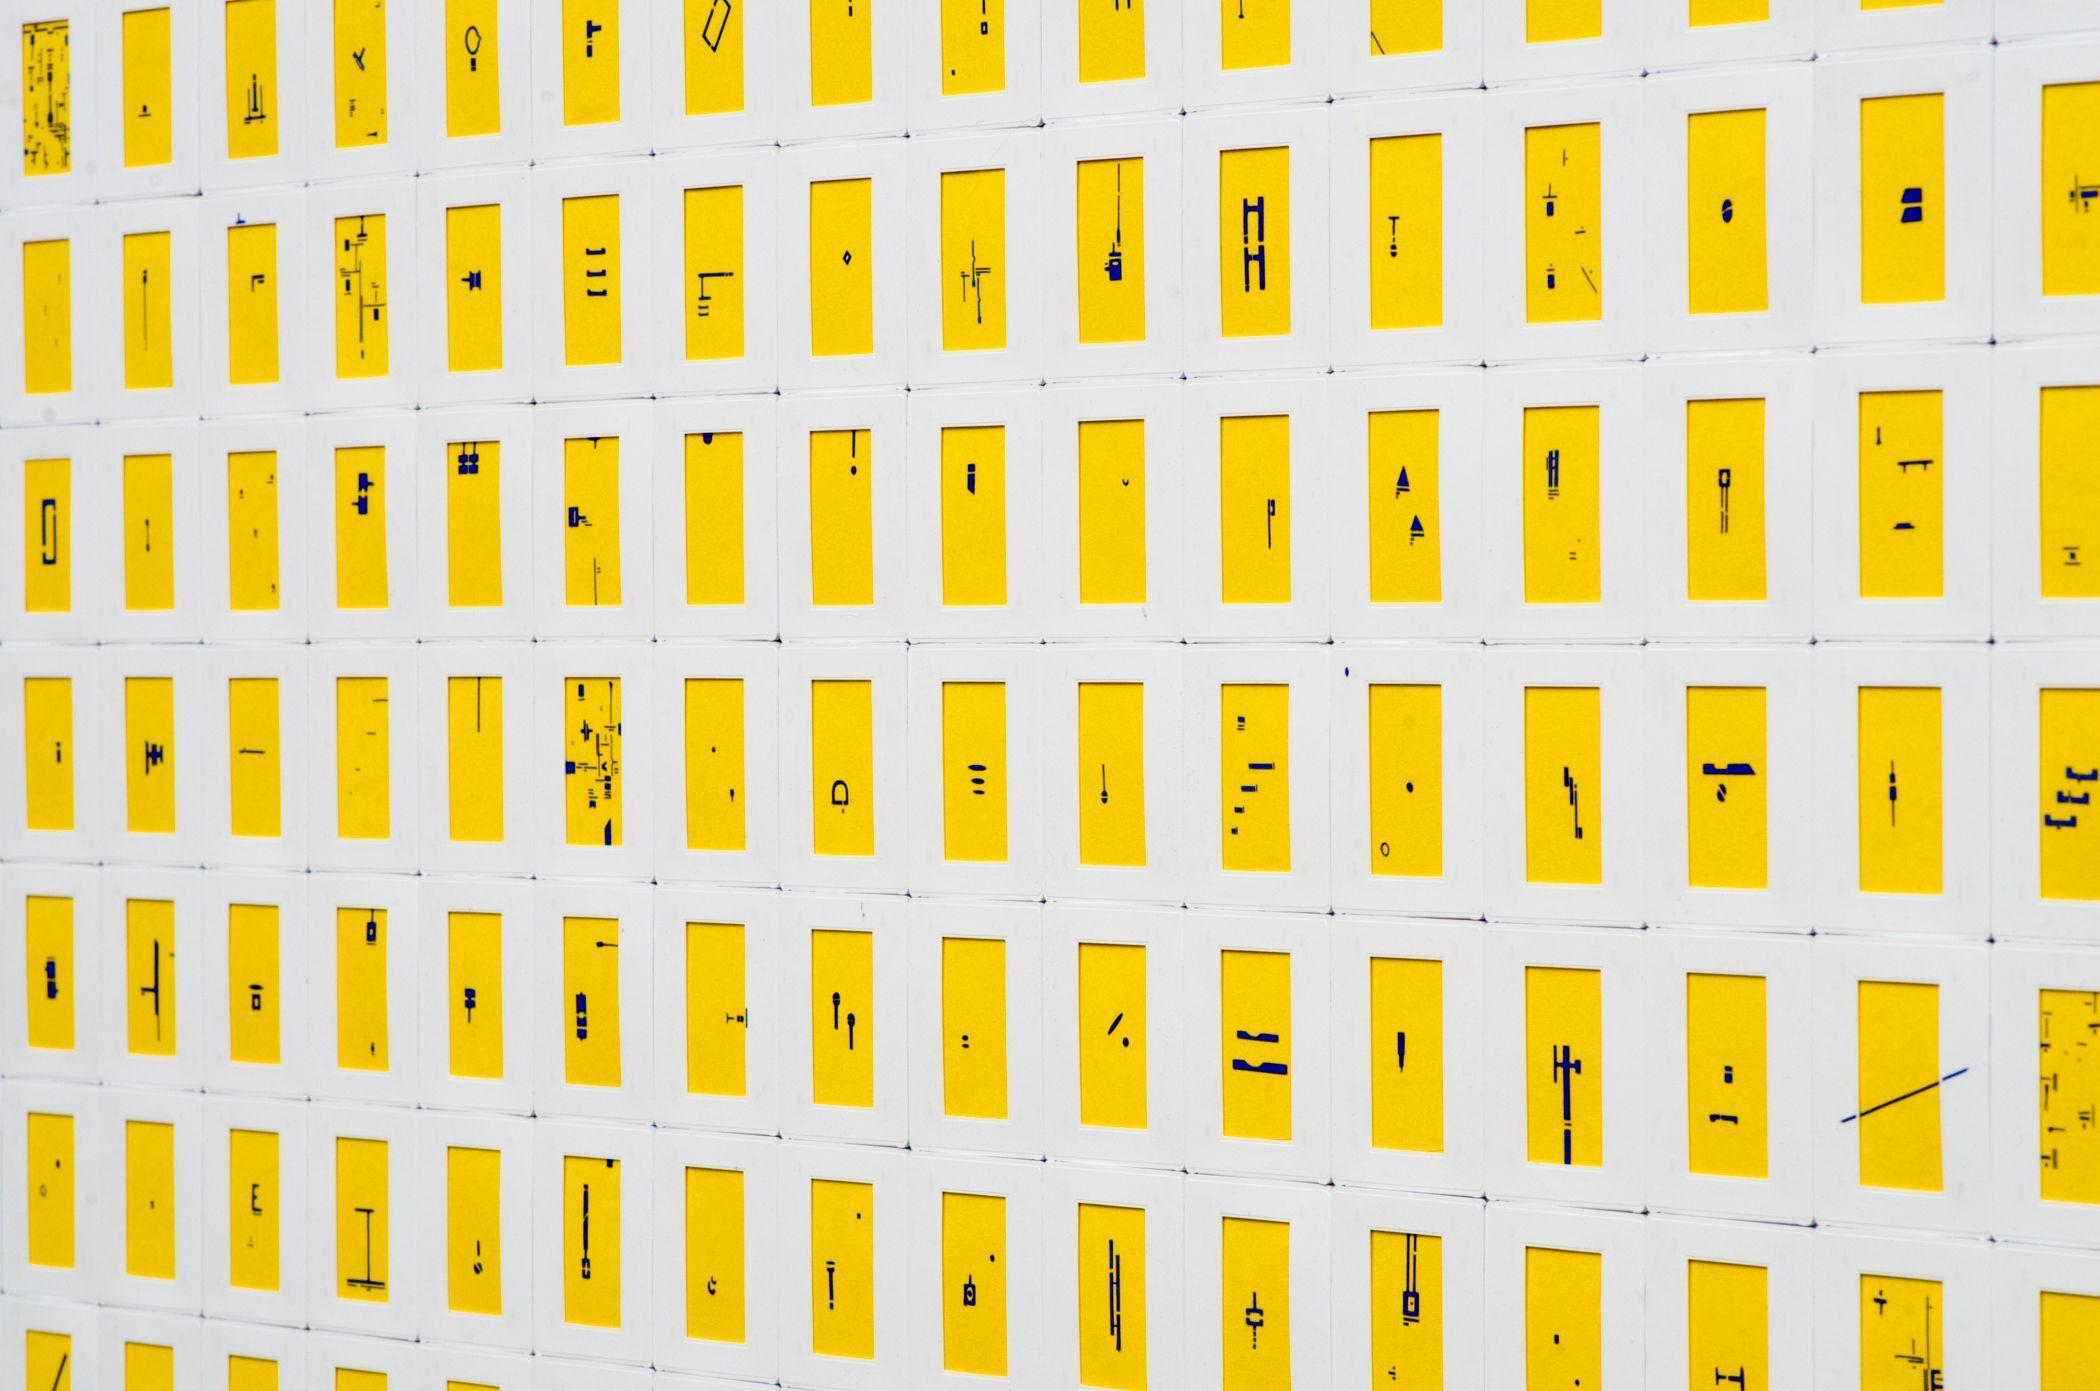 Marco Maggi, Optimismo Radical (amarillo) (detalle), 2016. Foto: Walter Otto. Cortesía: Espacio Monitor